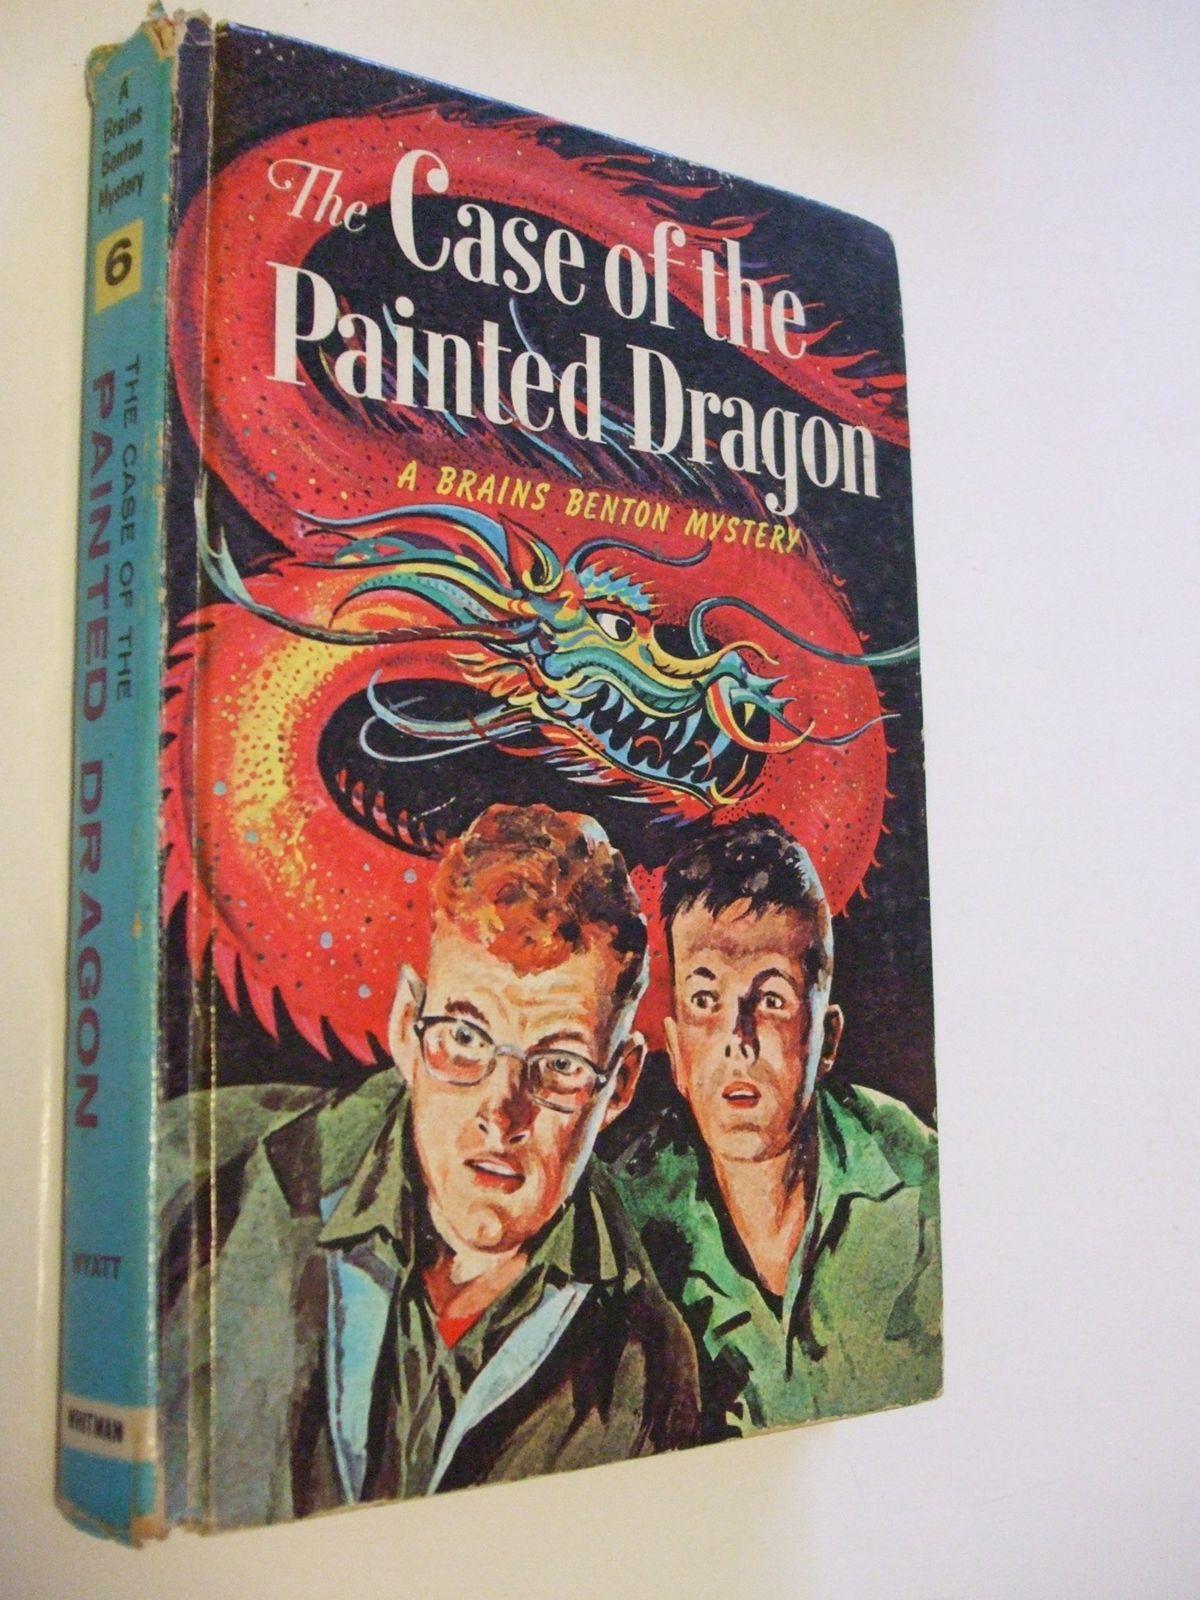 A Brains Benton Mystery Wyatt Counterfeit Coin Painted Dragon Roving Rolls Books 1960 Book Artwork Books Mystery